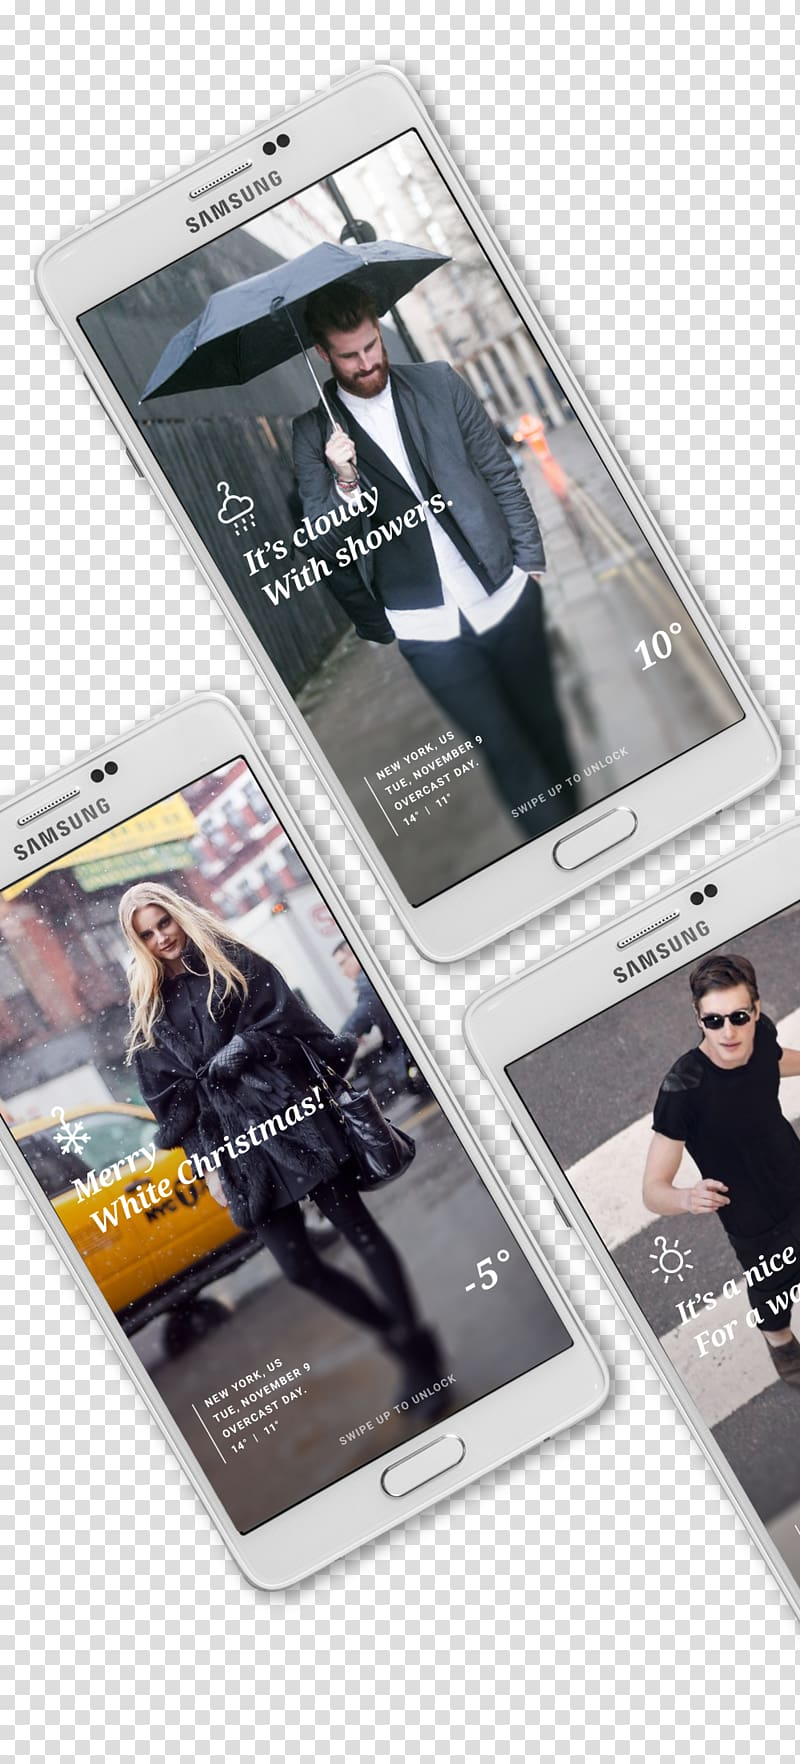 Smartphone Naver Blog Fashion Magazine Multimedia, chloe.